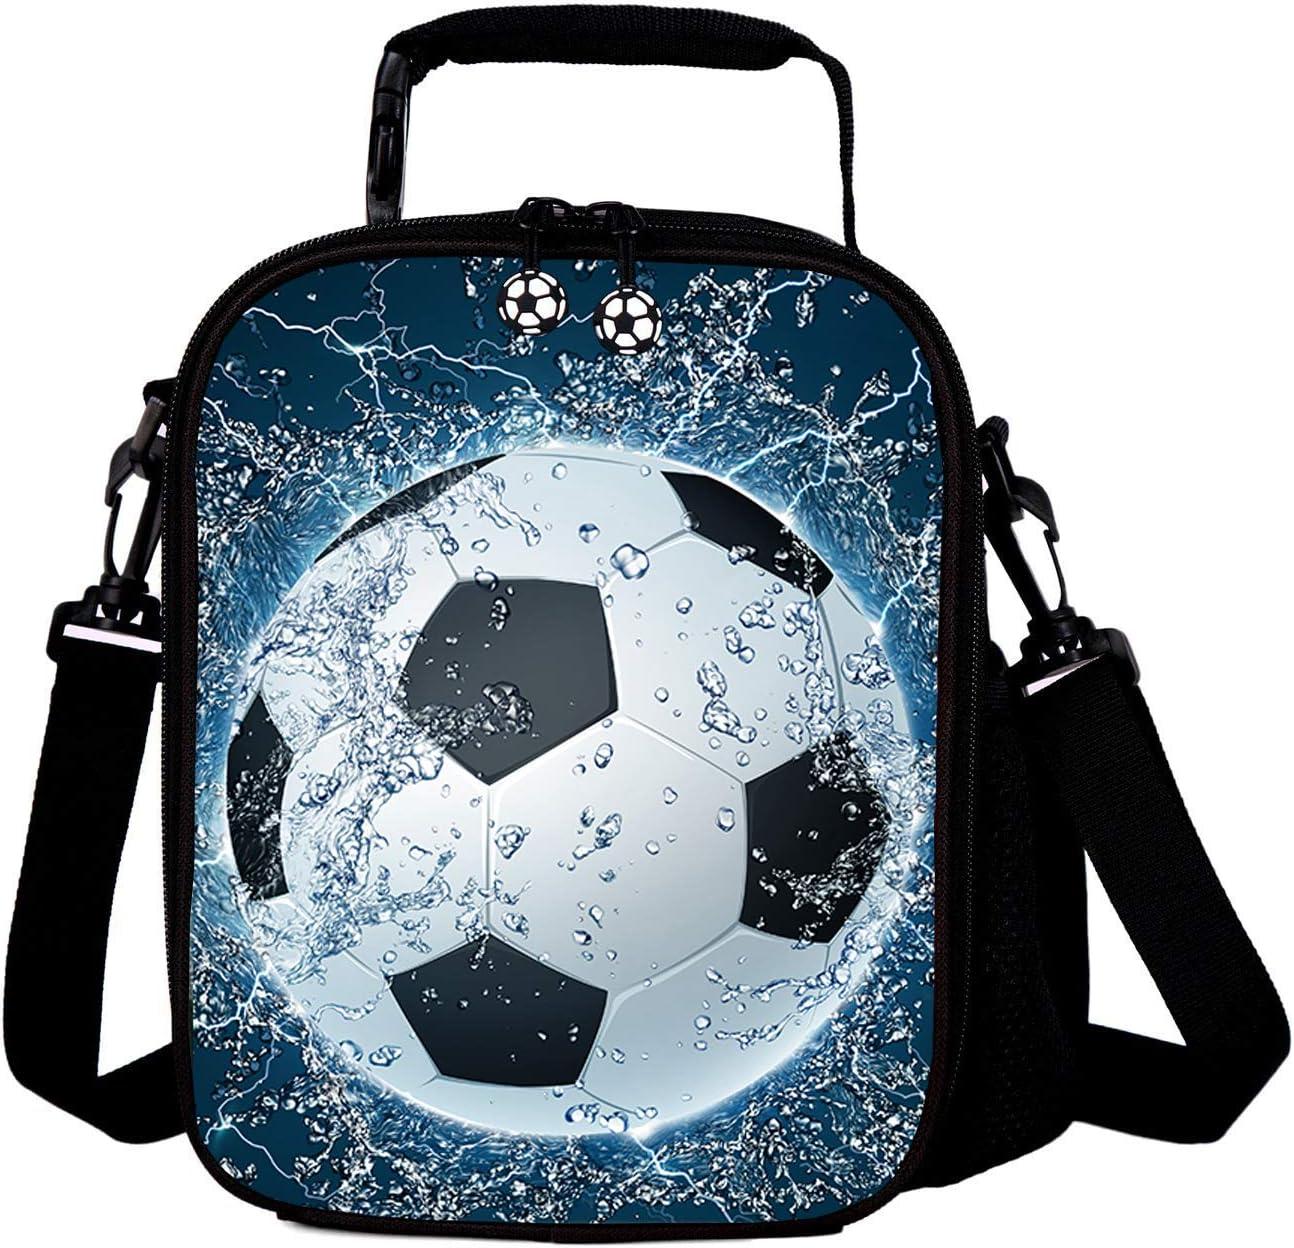 7-Mi Kids Lunch Box Bag Reusable Portable Albuquerque Manufacturer OFFicial shop Mall Insulated Totes